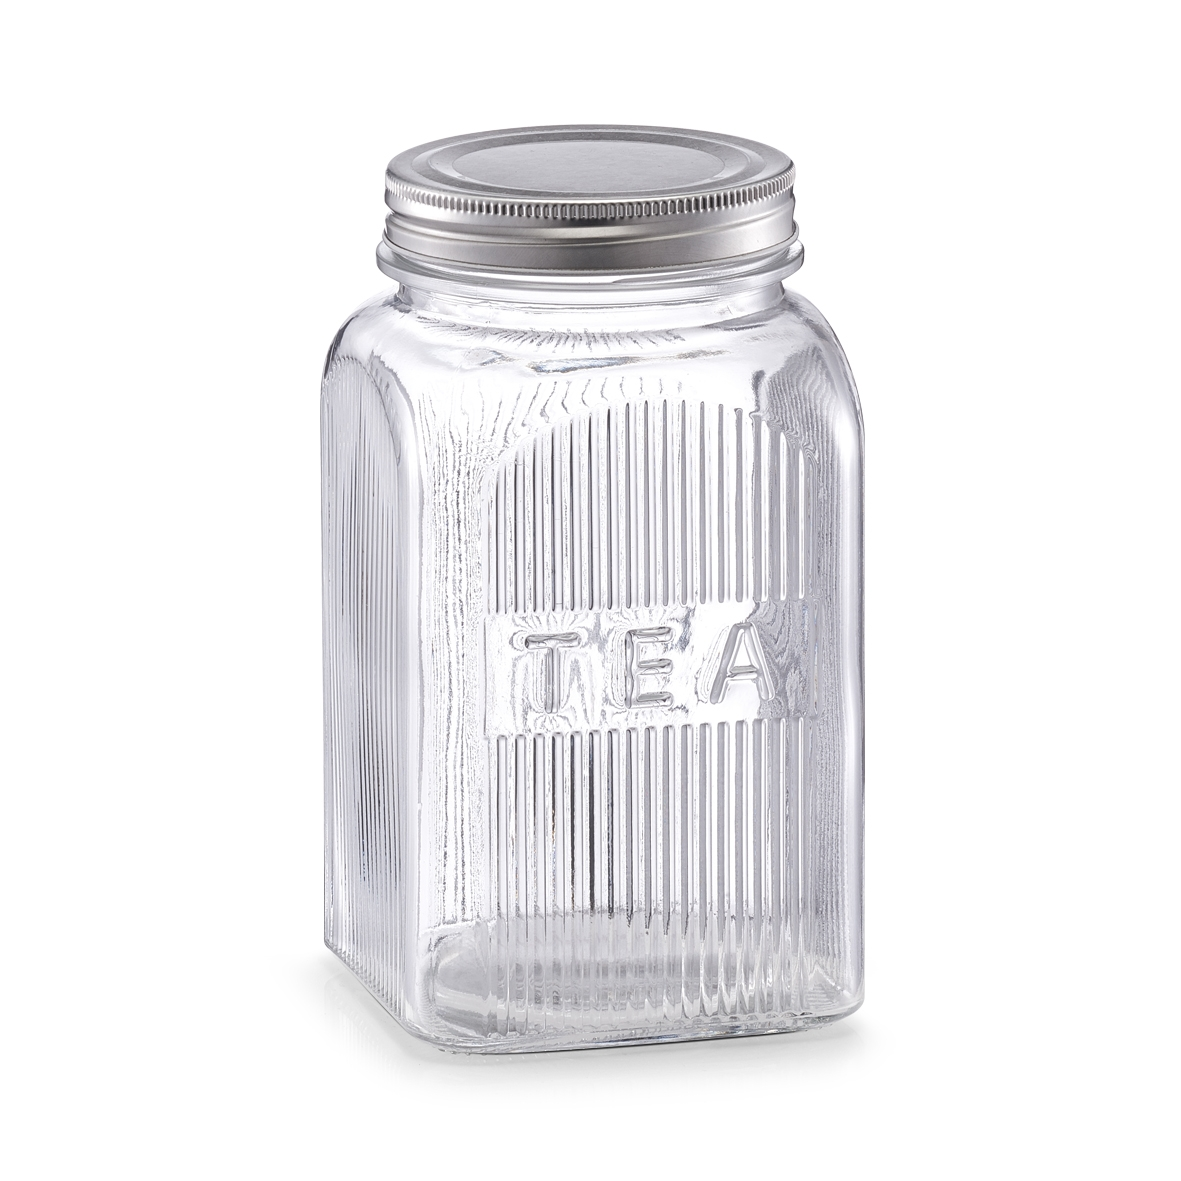 Recipient din sticla pentru ceai Tea, capac metalic, 1150 ml, l10xA10xH18 cm imagine